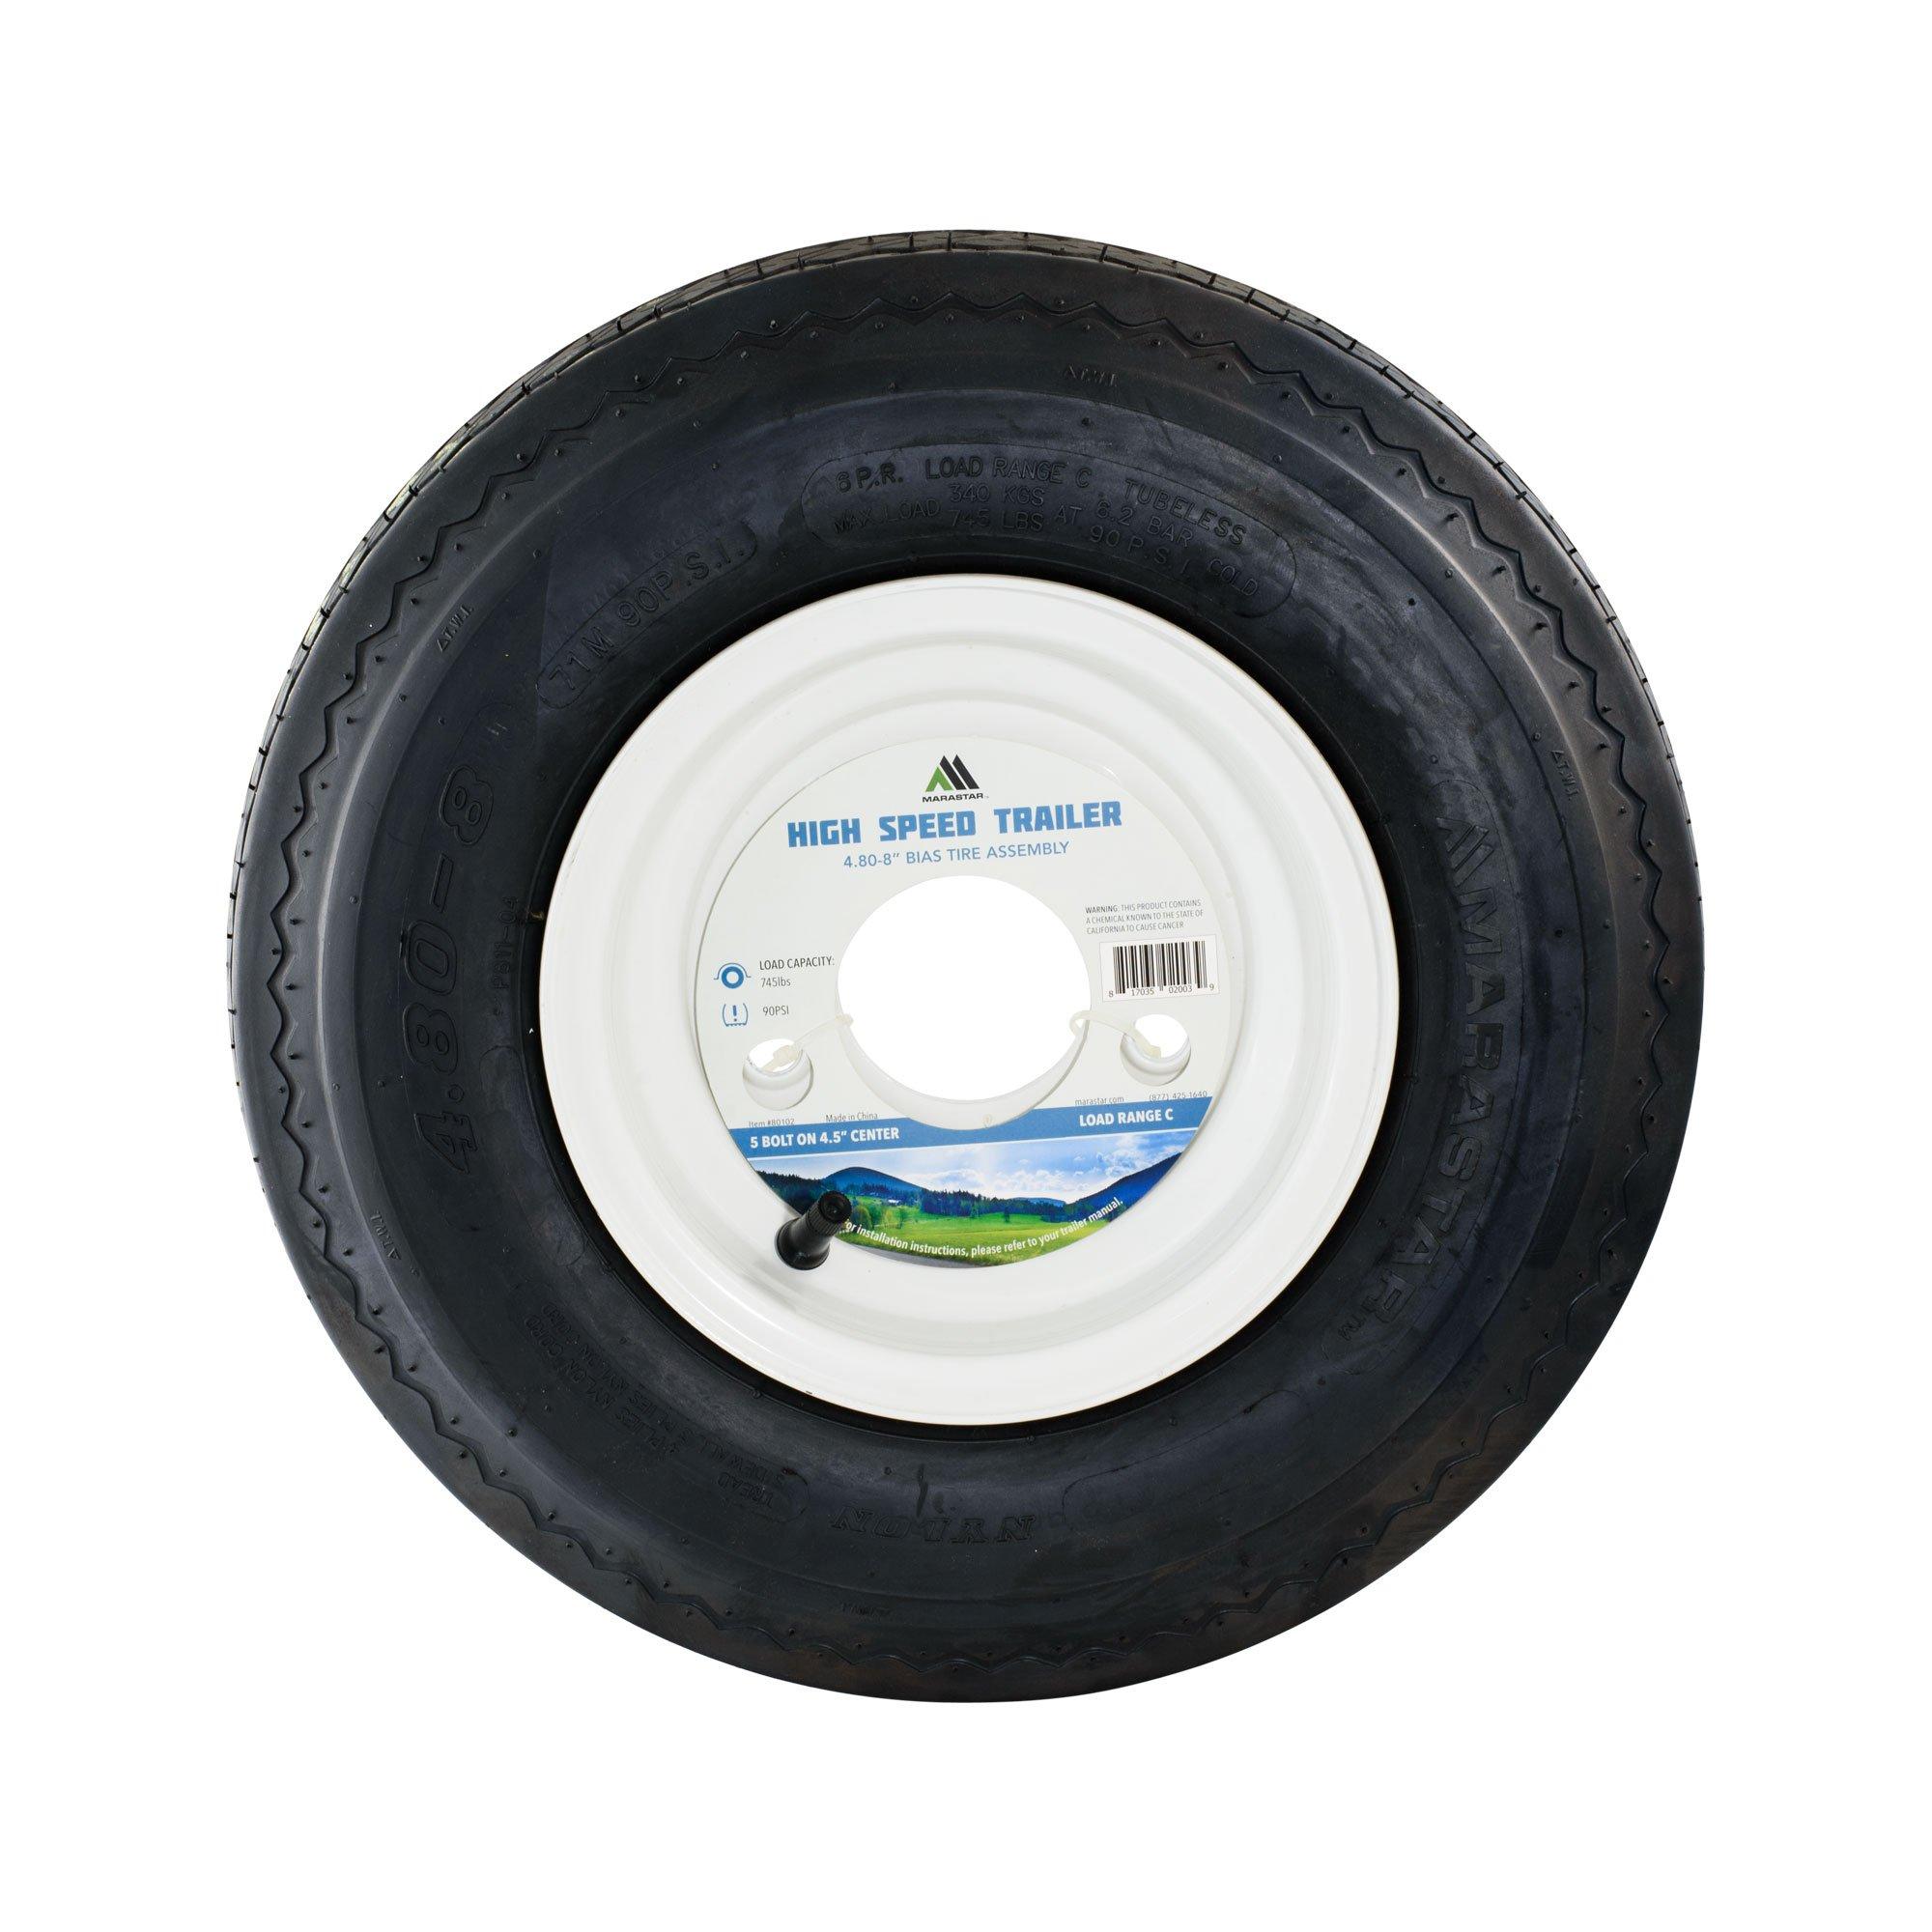 4.80-8 LRC Bias Trailer Tire Mounted on White Solid 5 Lug Wheel